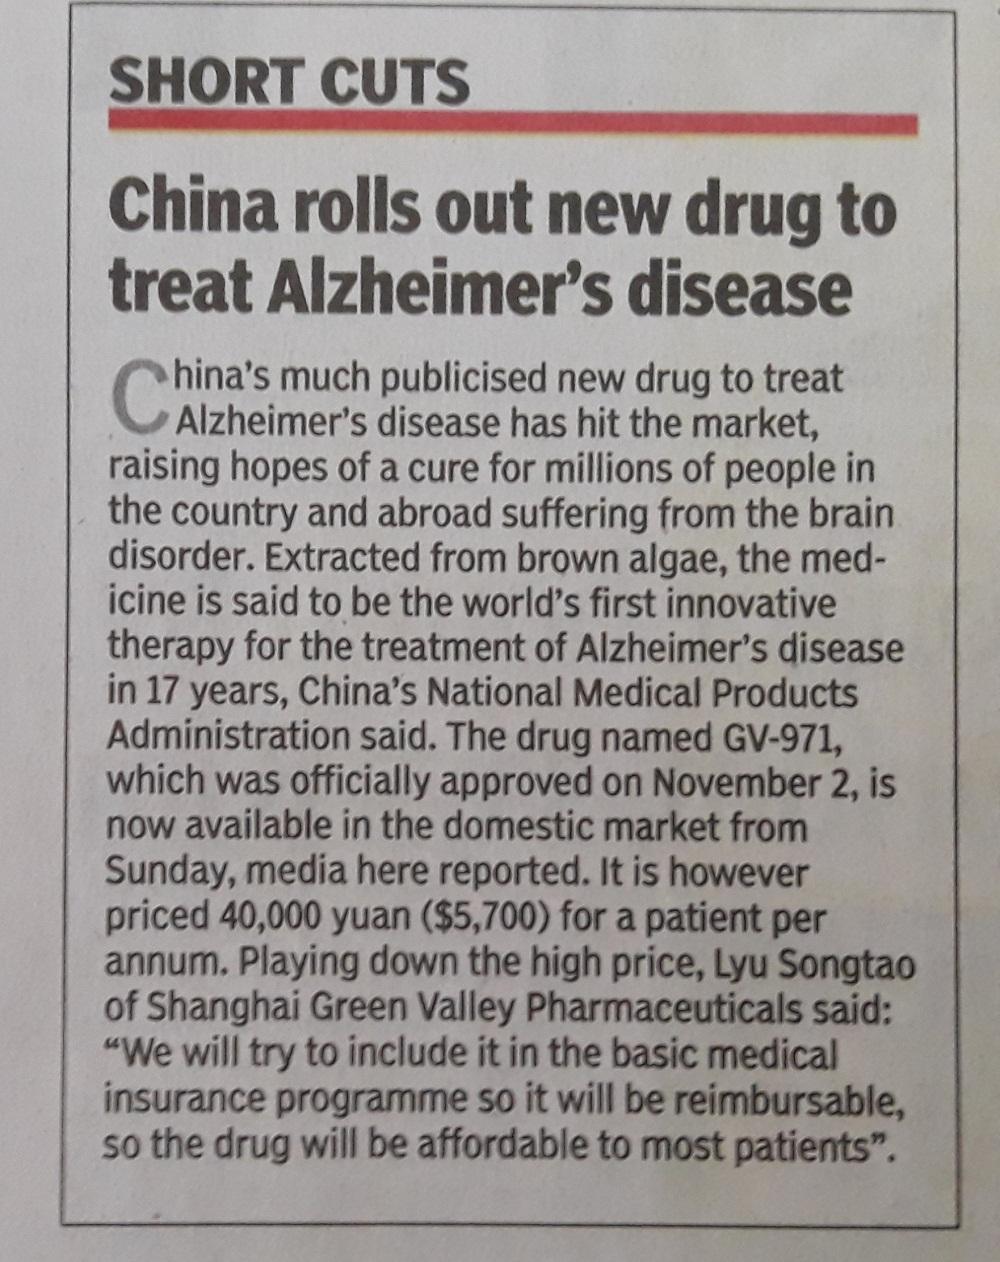 ALZHEIMER'S DISEASE IS CURABLE